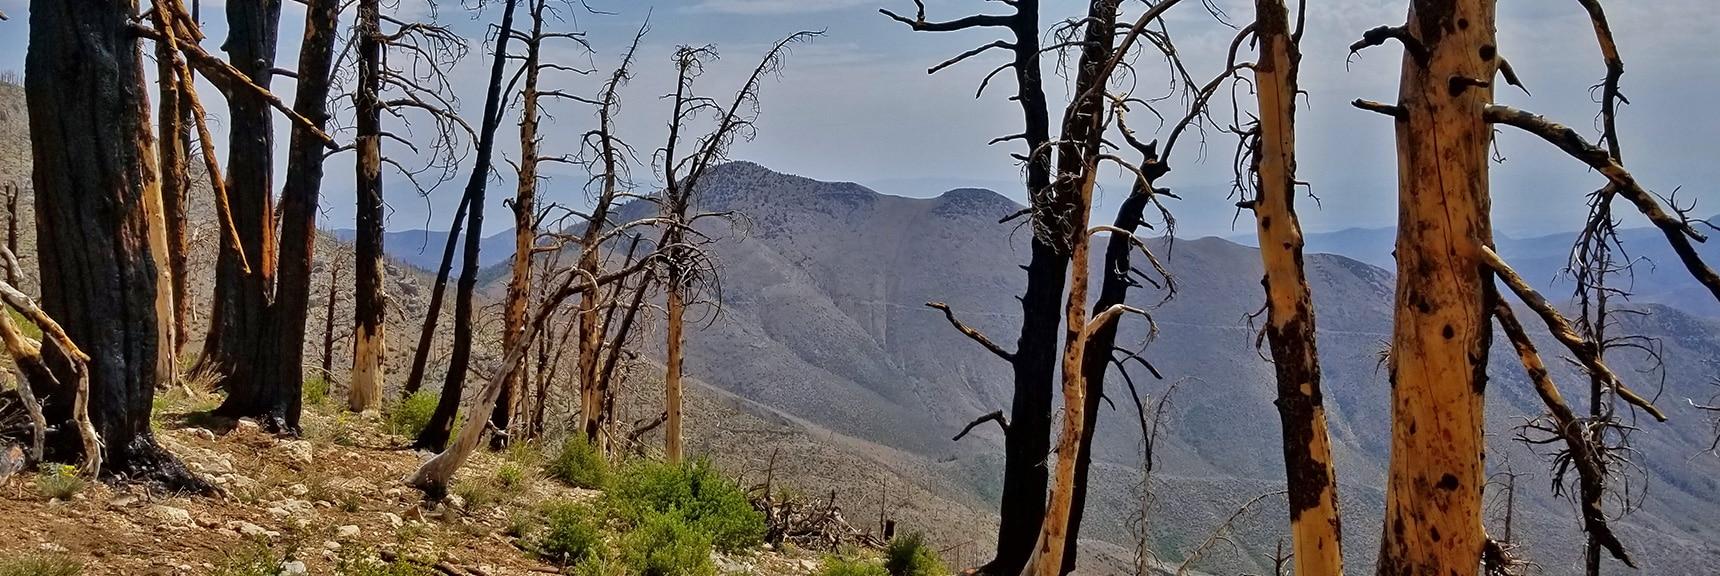 Harris Mountain Viewed from About 1,500ft Below Griffith Peak on Sexton Ridge. | Sexton Ridge Descent from Griffith Peak, Mt. Charleston Wilderness, Spring Mountains, Nevada